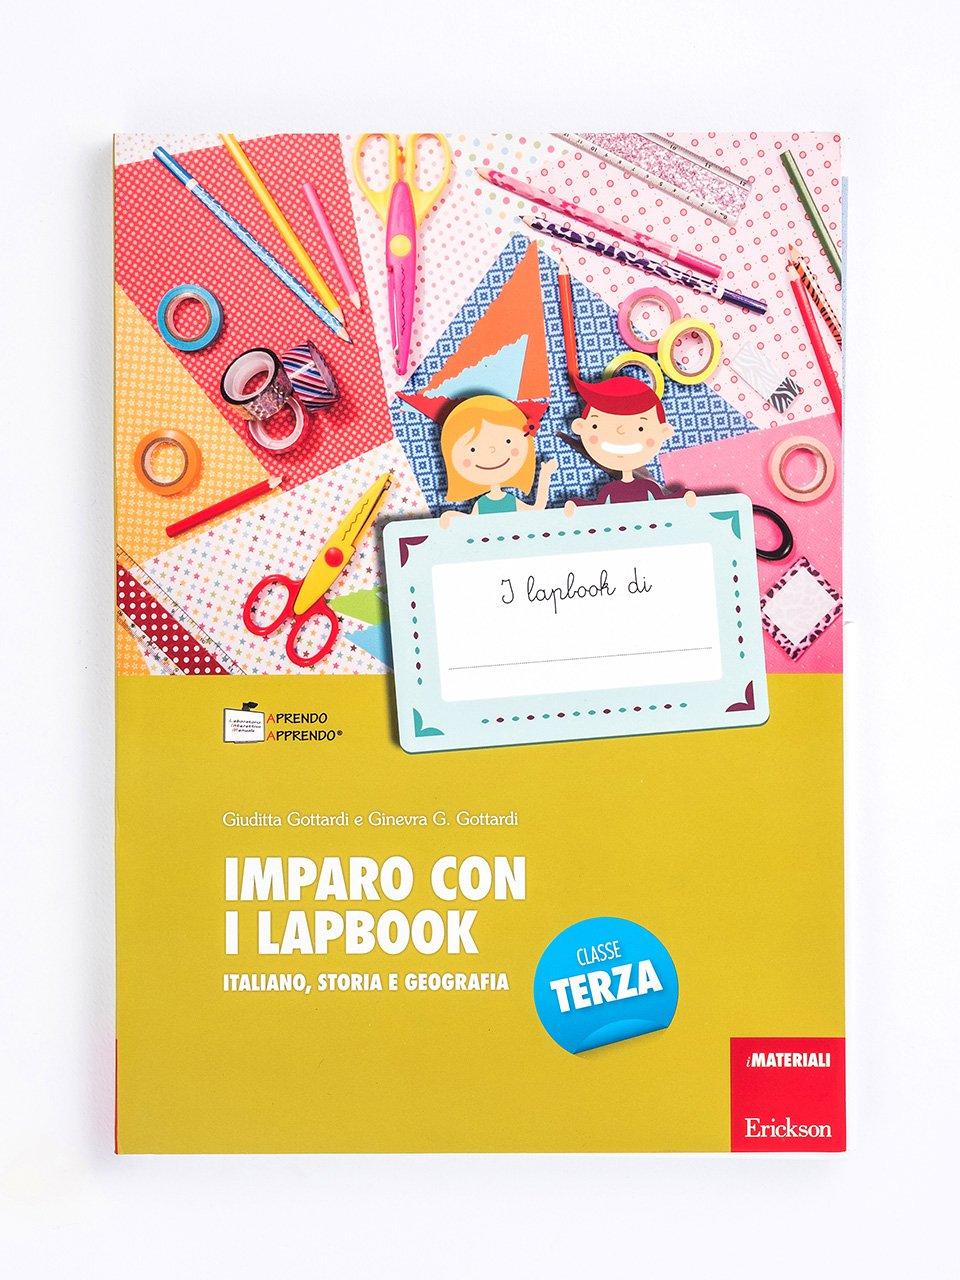 Imparo con i lapbook - Italiano, storia e geografia - Classe terza - Ginevra G. Gottardi - Erickson